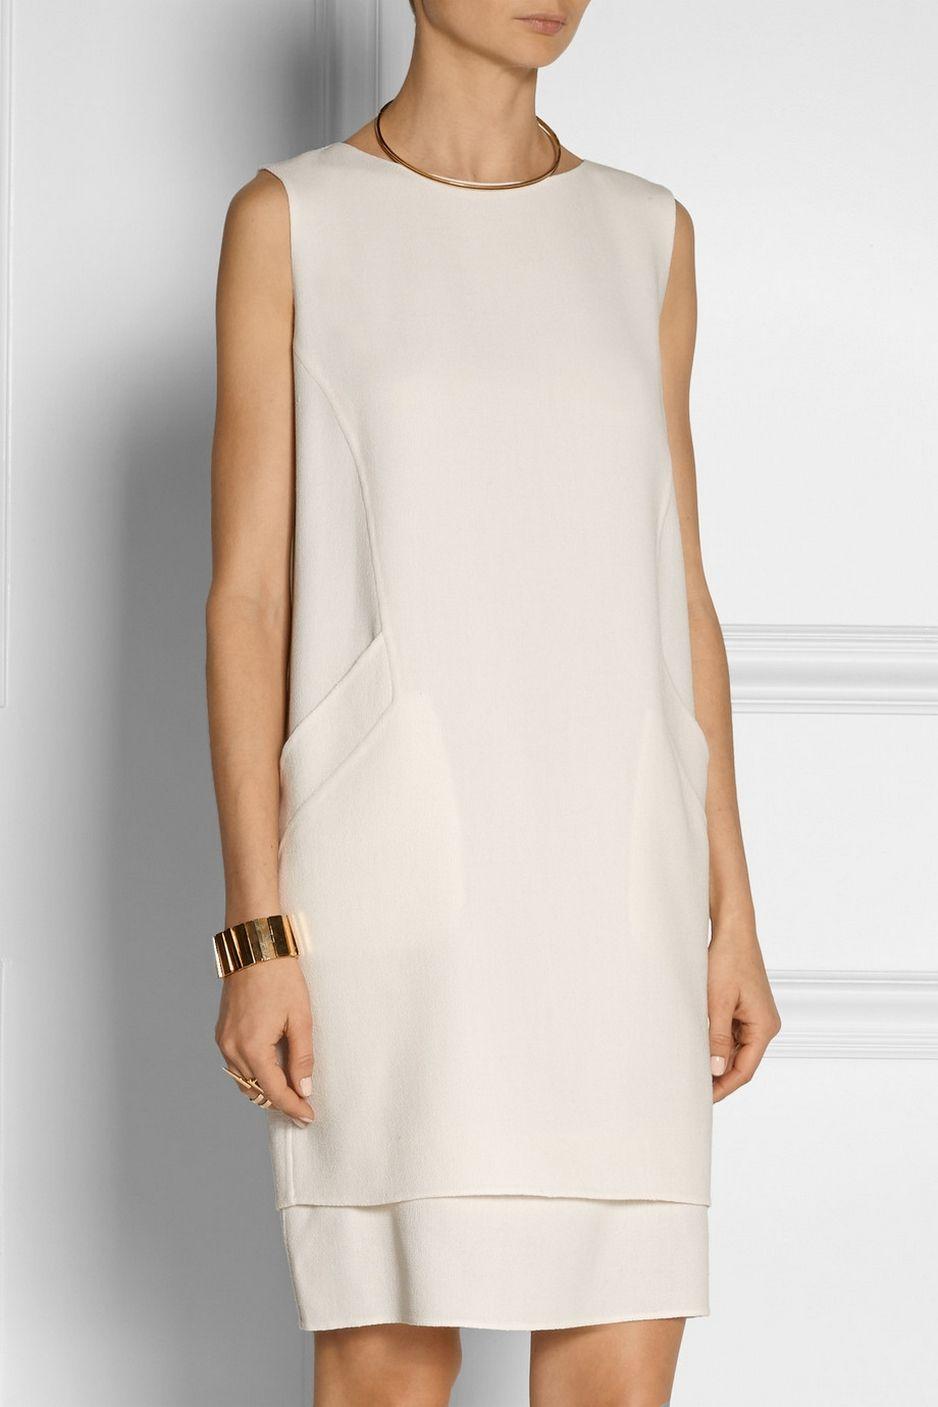 150 Beautiful Shift Dresses Fashion Suitable For Summer Fashion Simple Dresses Fashion Dresses [ 1407 x 938 Pixel ]